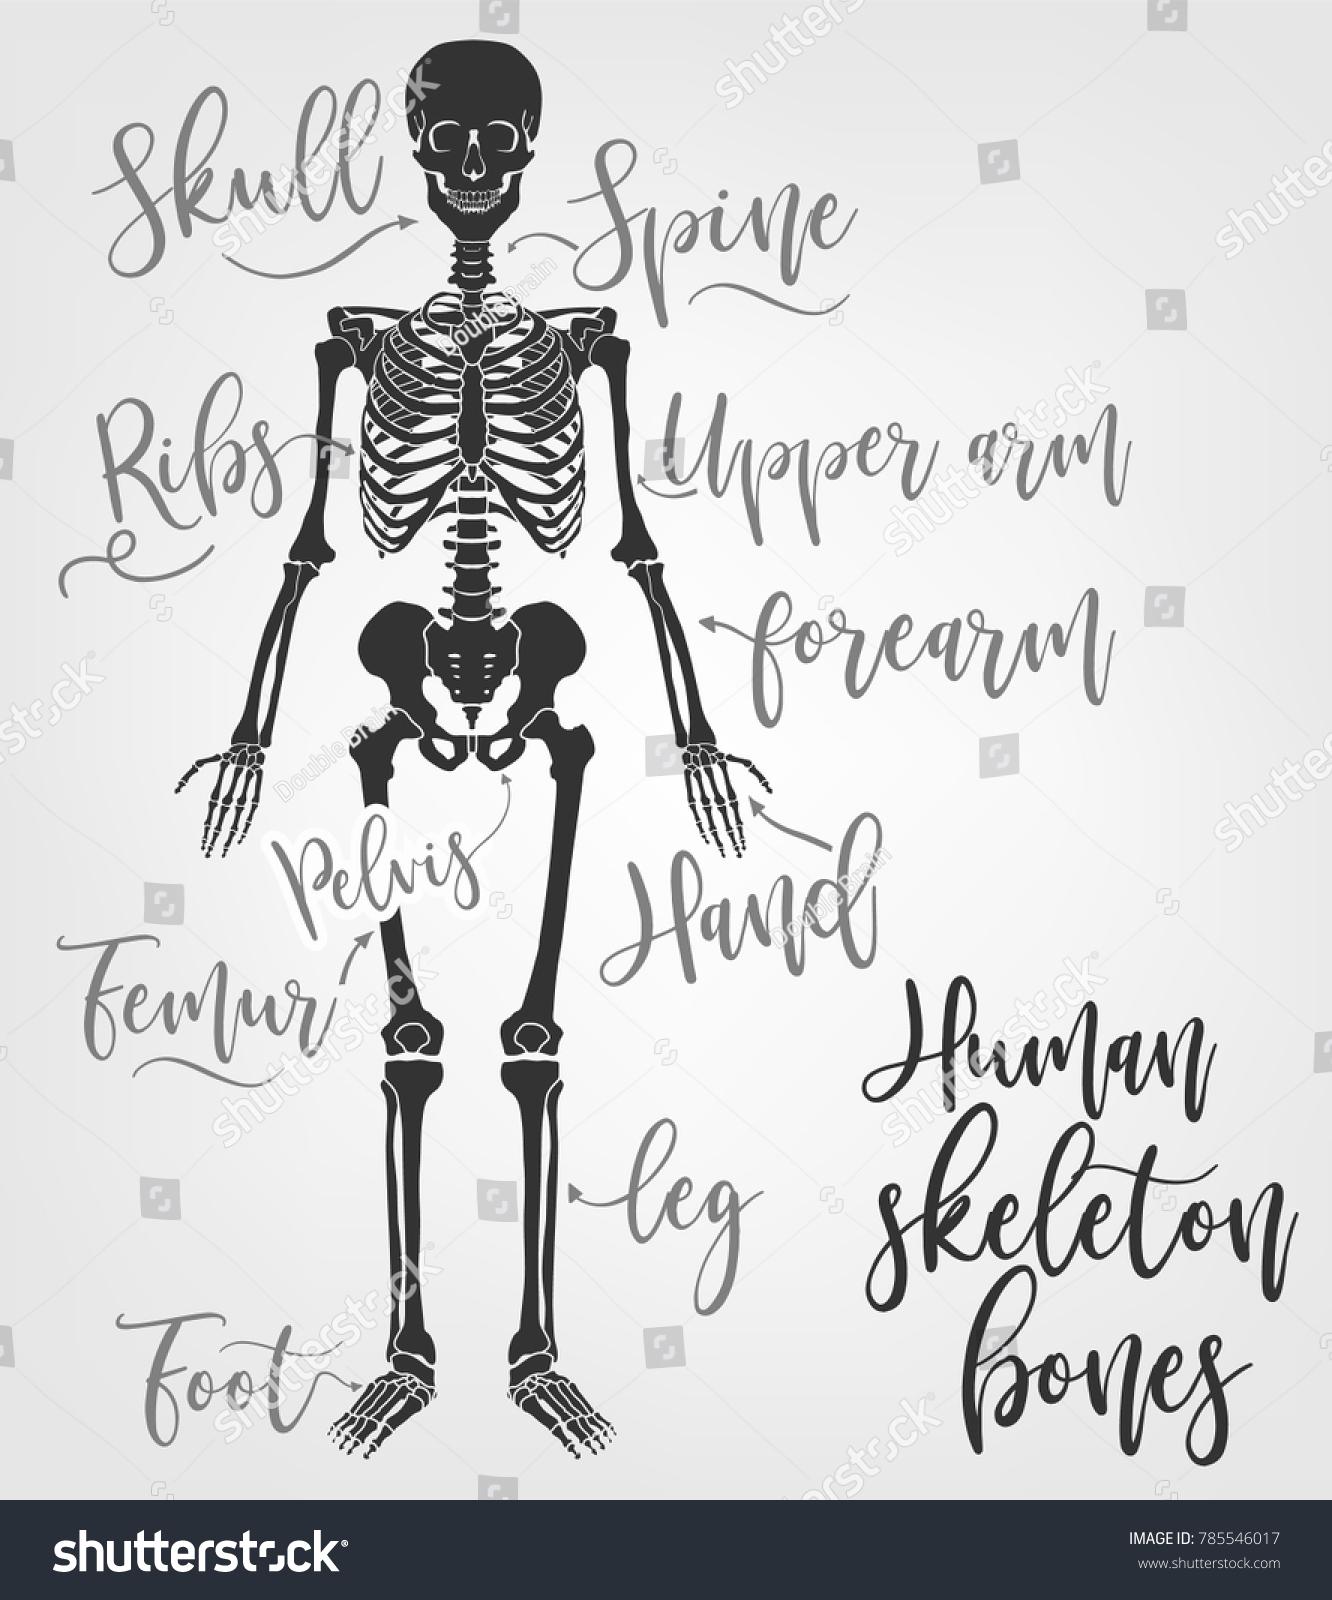 Human Skeleton Bones Vector Illustration Flat Stock Vector Royalty